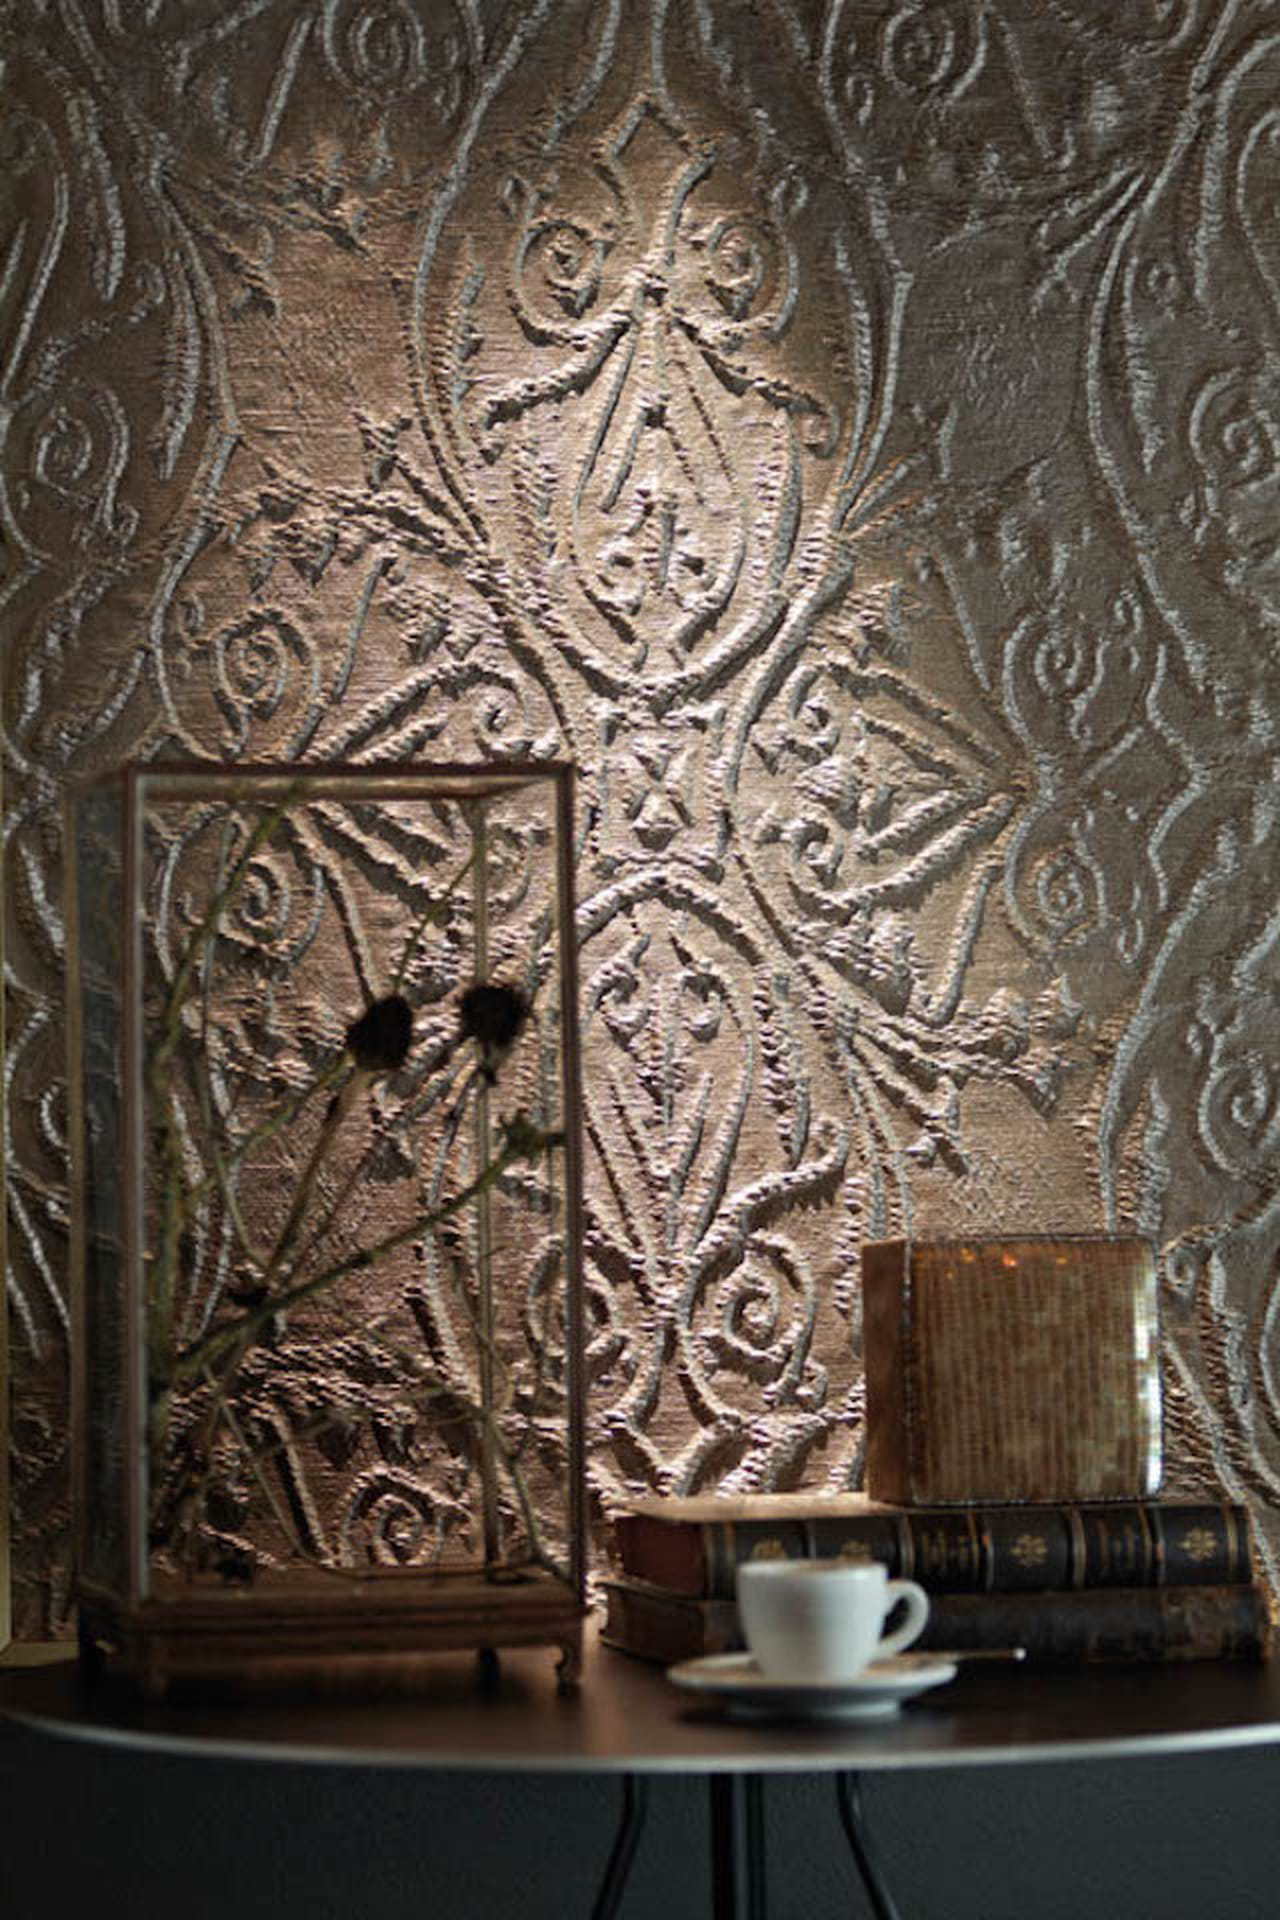 Pannelli decorativi per pareti interne rivestimenti ad hoc - Pannelli decorativi per porte ...